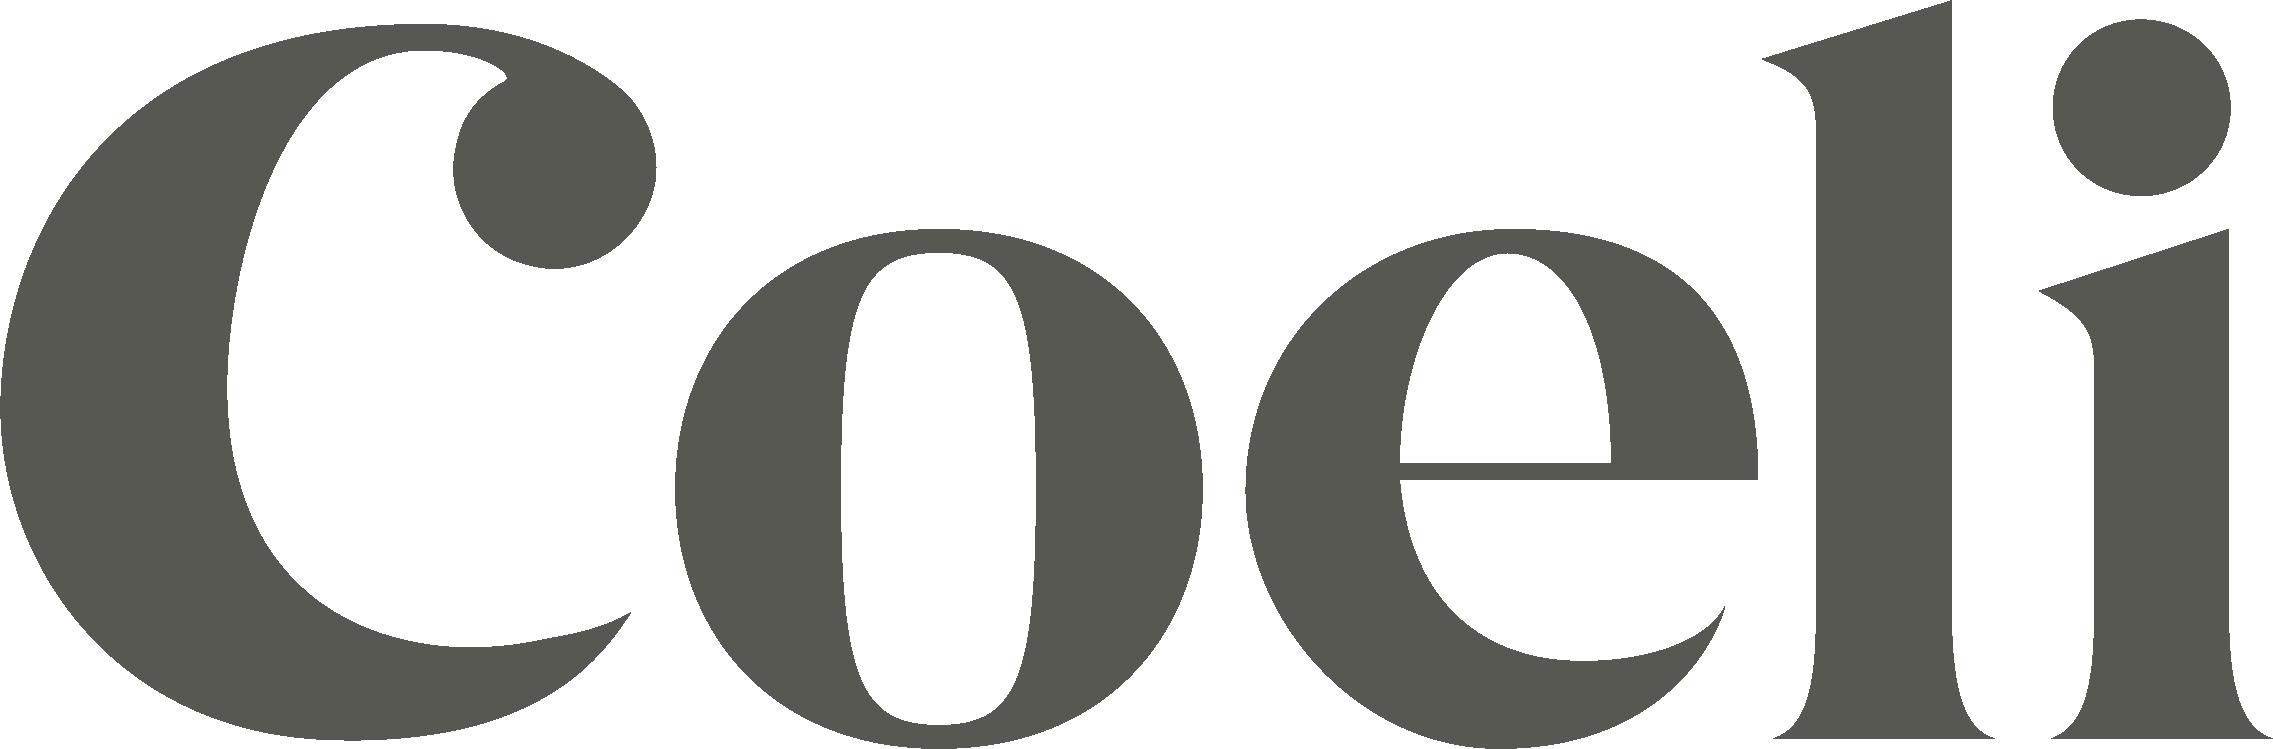 Coeli logotyp